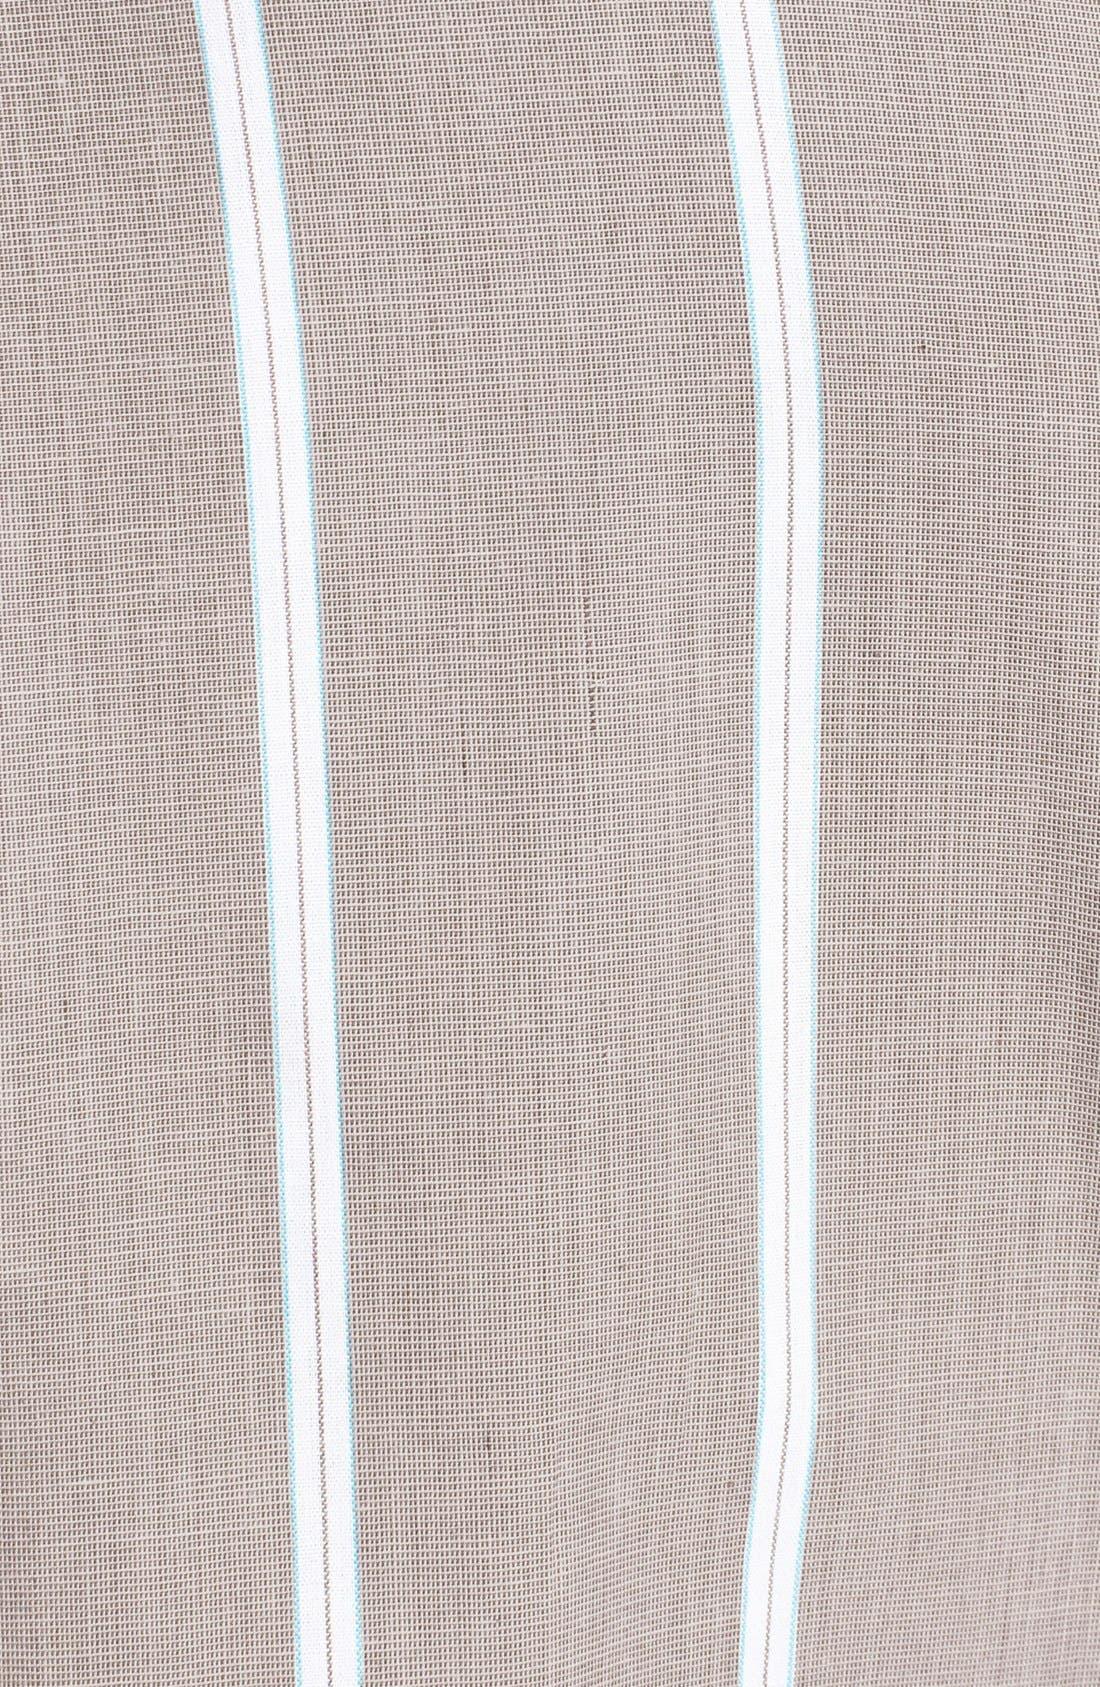 Alternate Image 3  - Brixton 'Baylor' Stripe Oxford Shirt